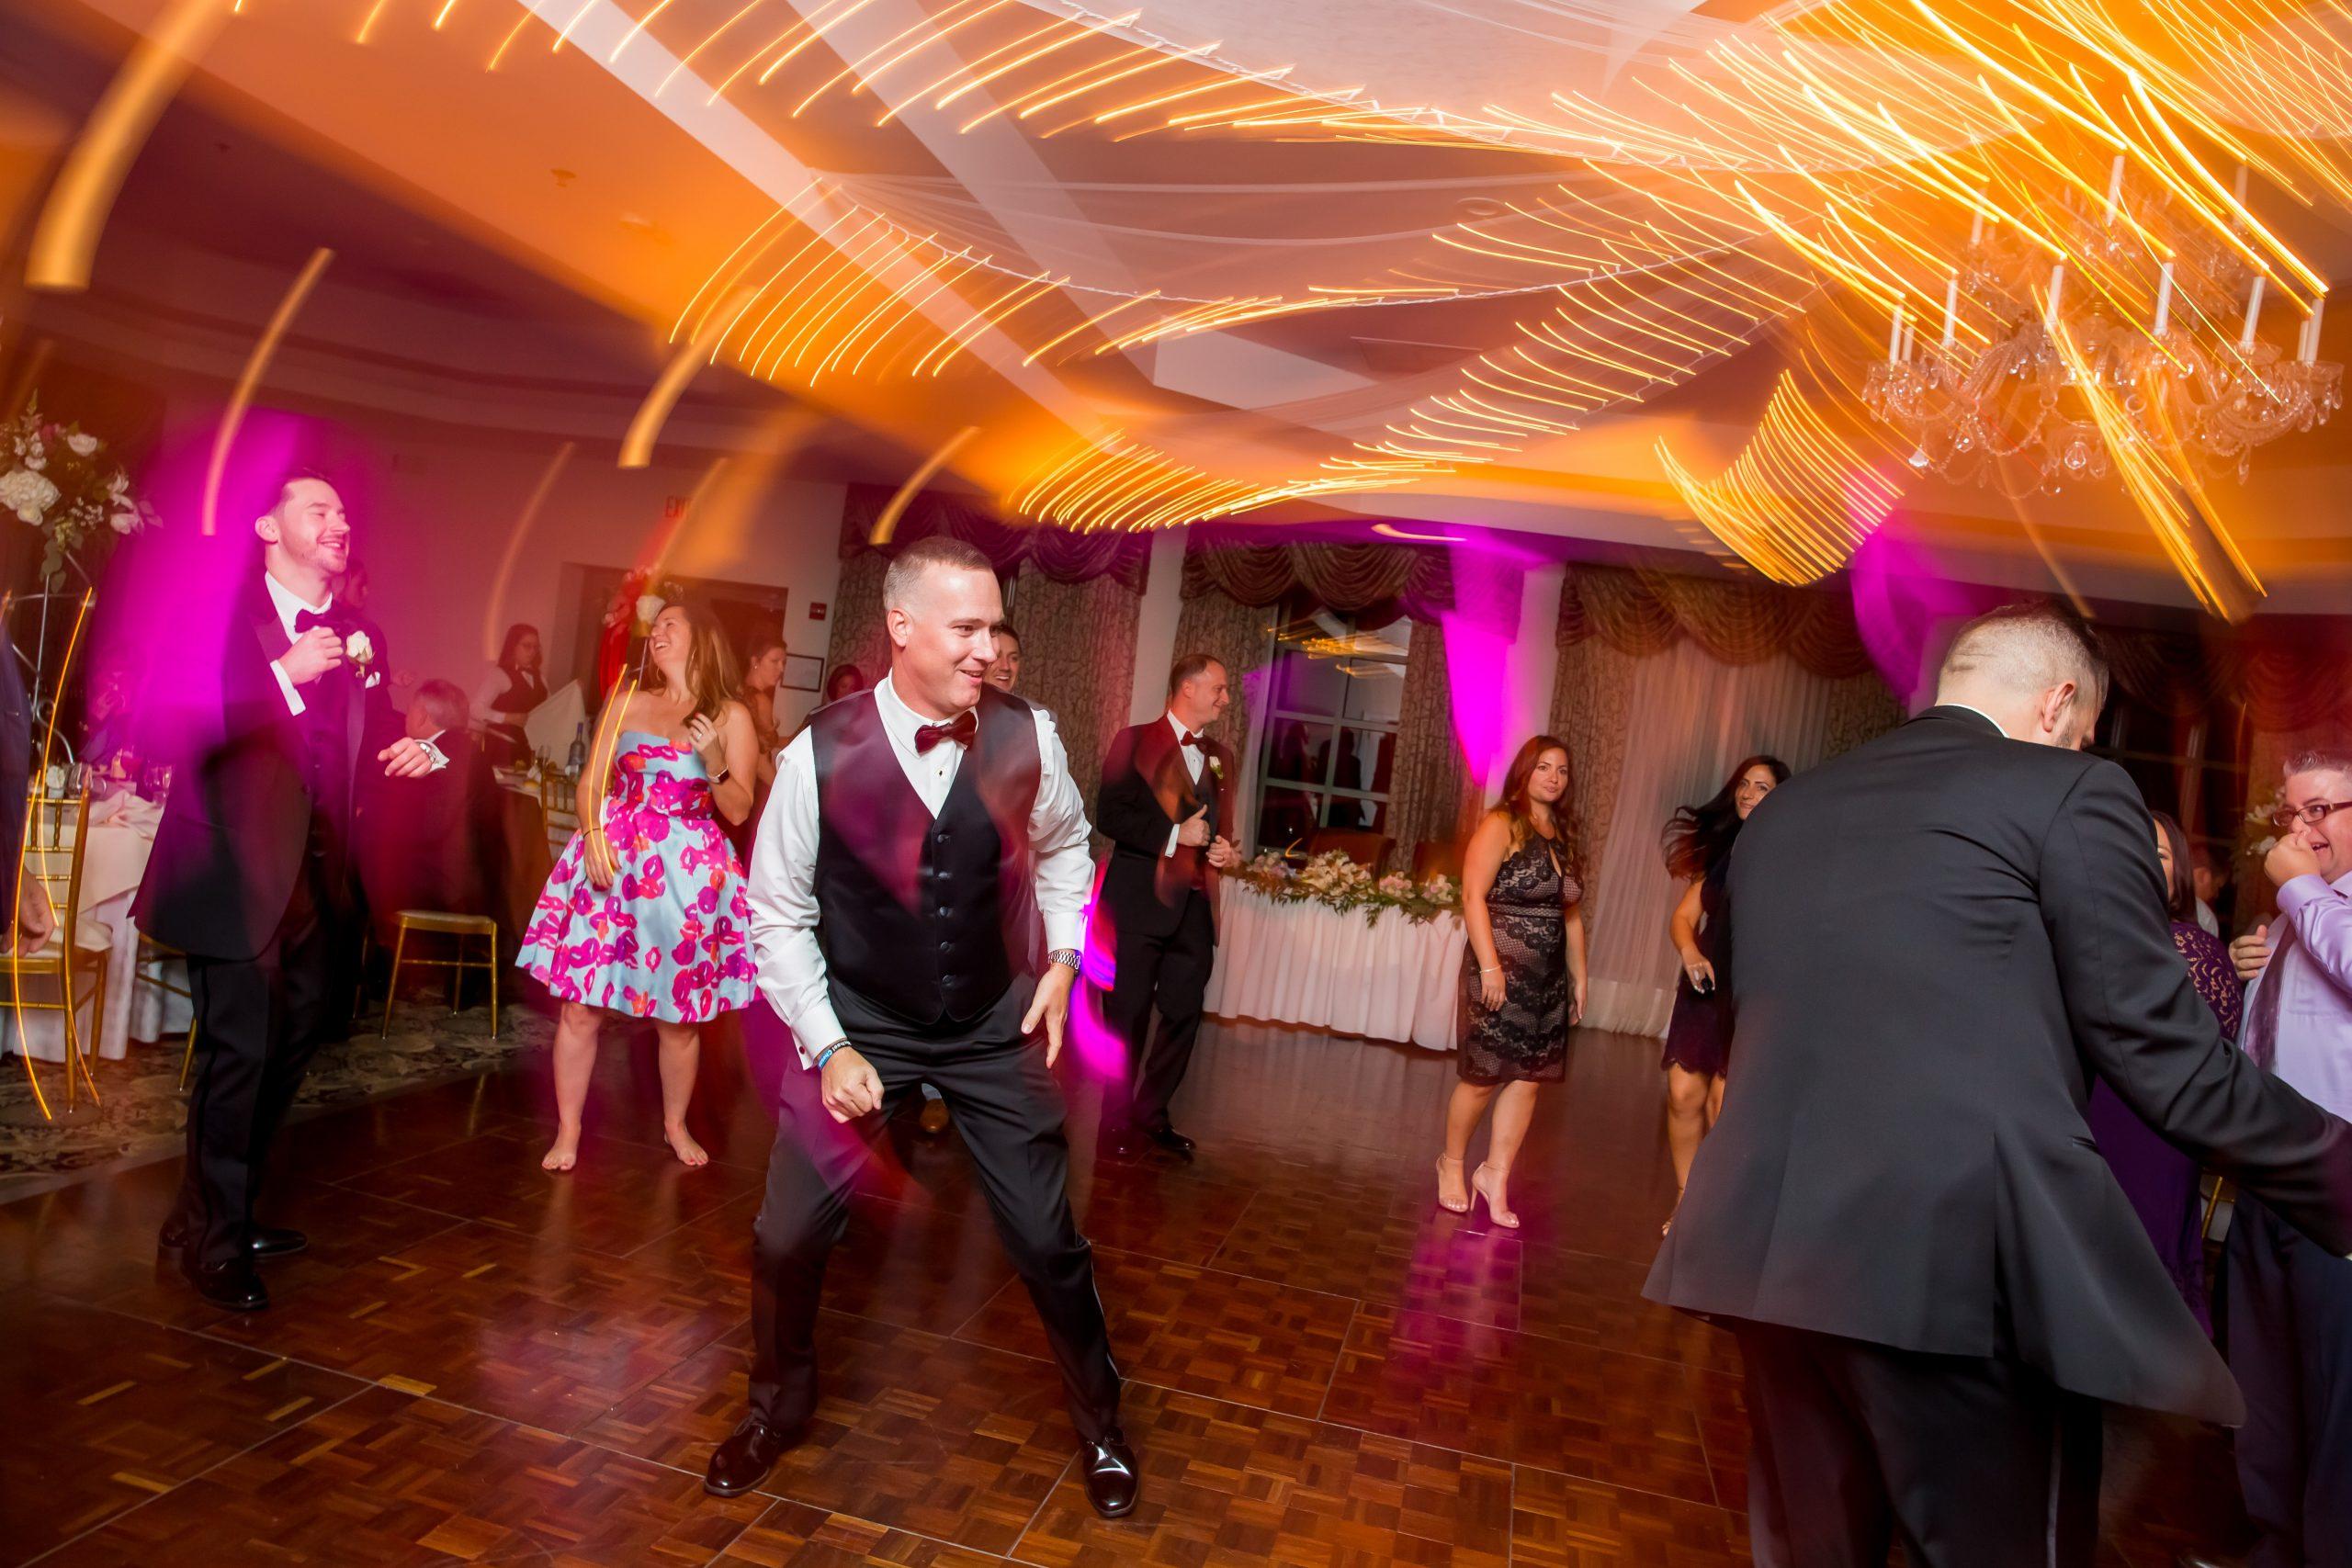 Victori_Rob_Mohawk River Country Club Wedding-60.jpg